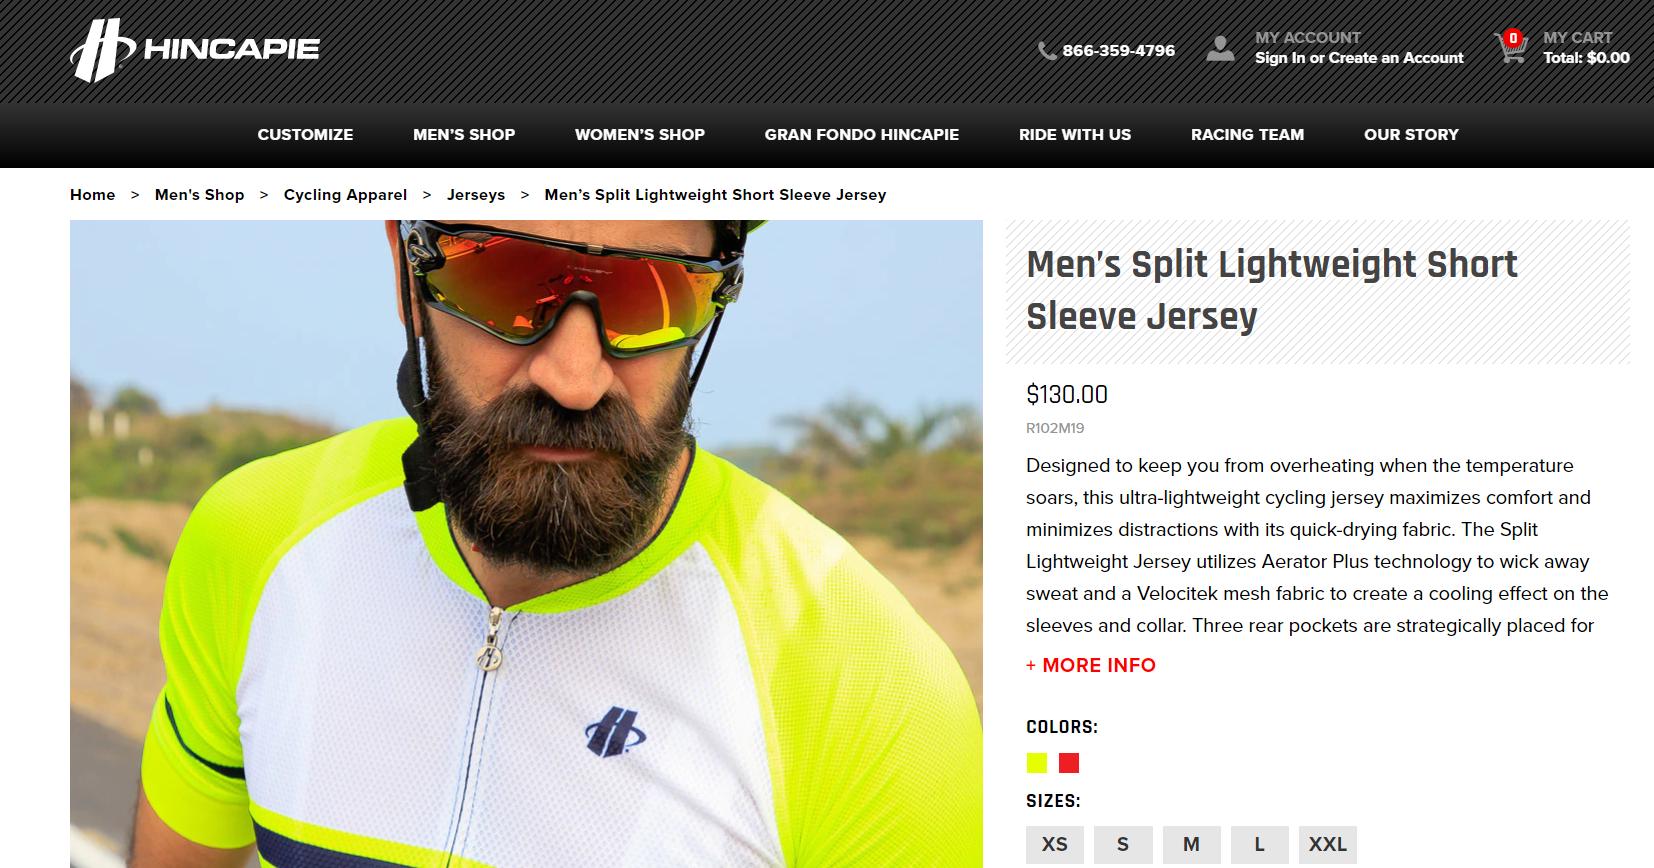 Bearded man with sunglass wearing Sleeve Jersey